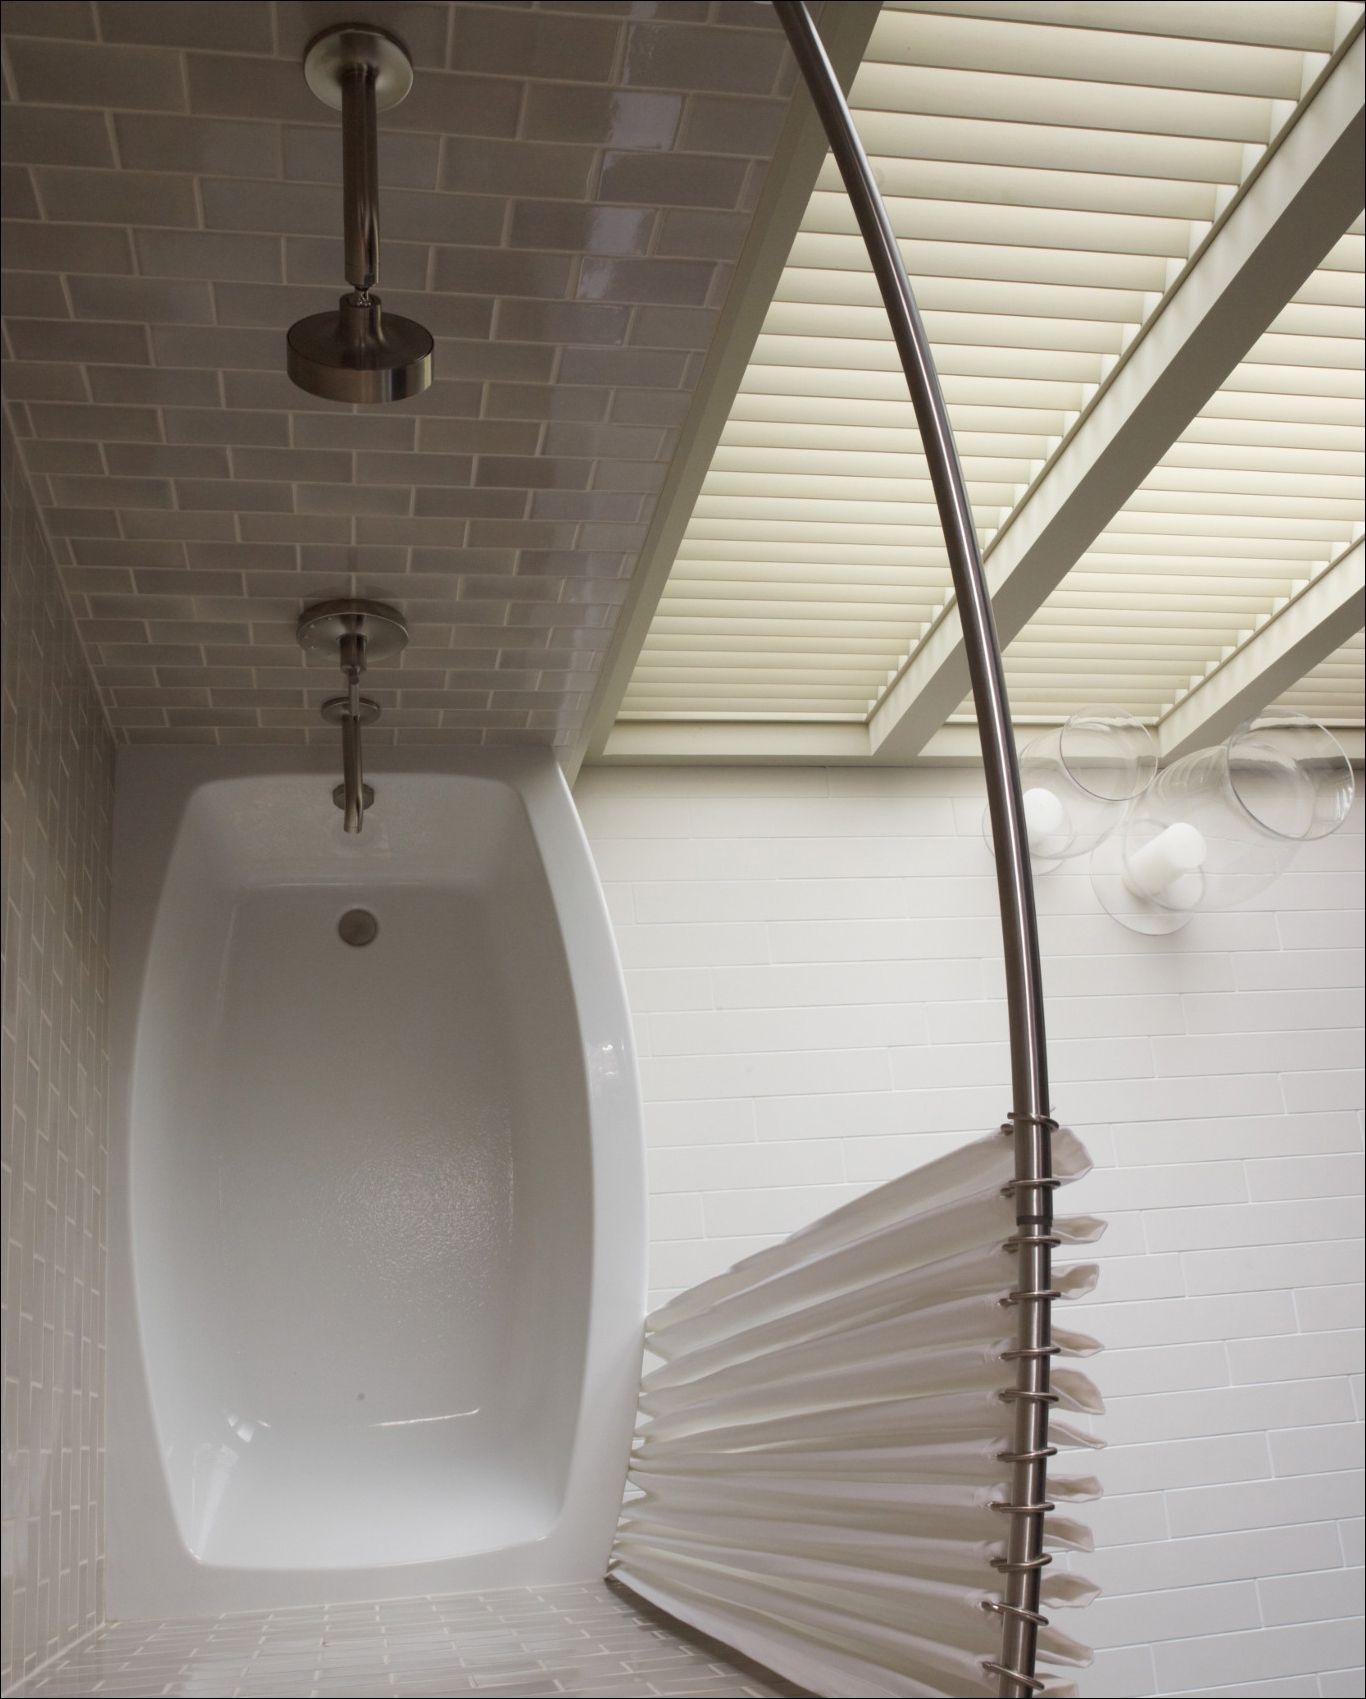 Kohler K 1118 La In 2019 Shower Tub Kohler Bathtub Tub